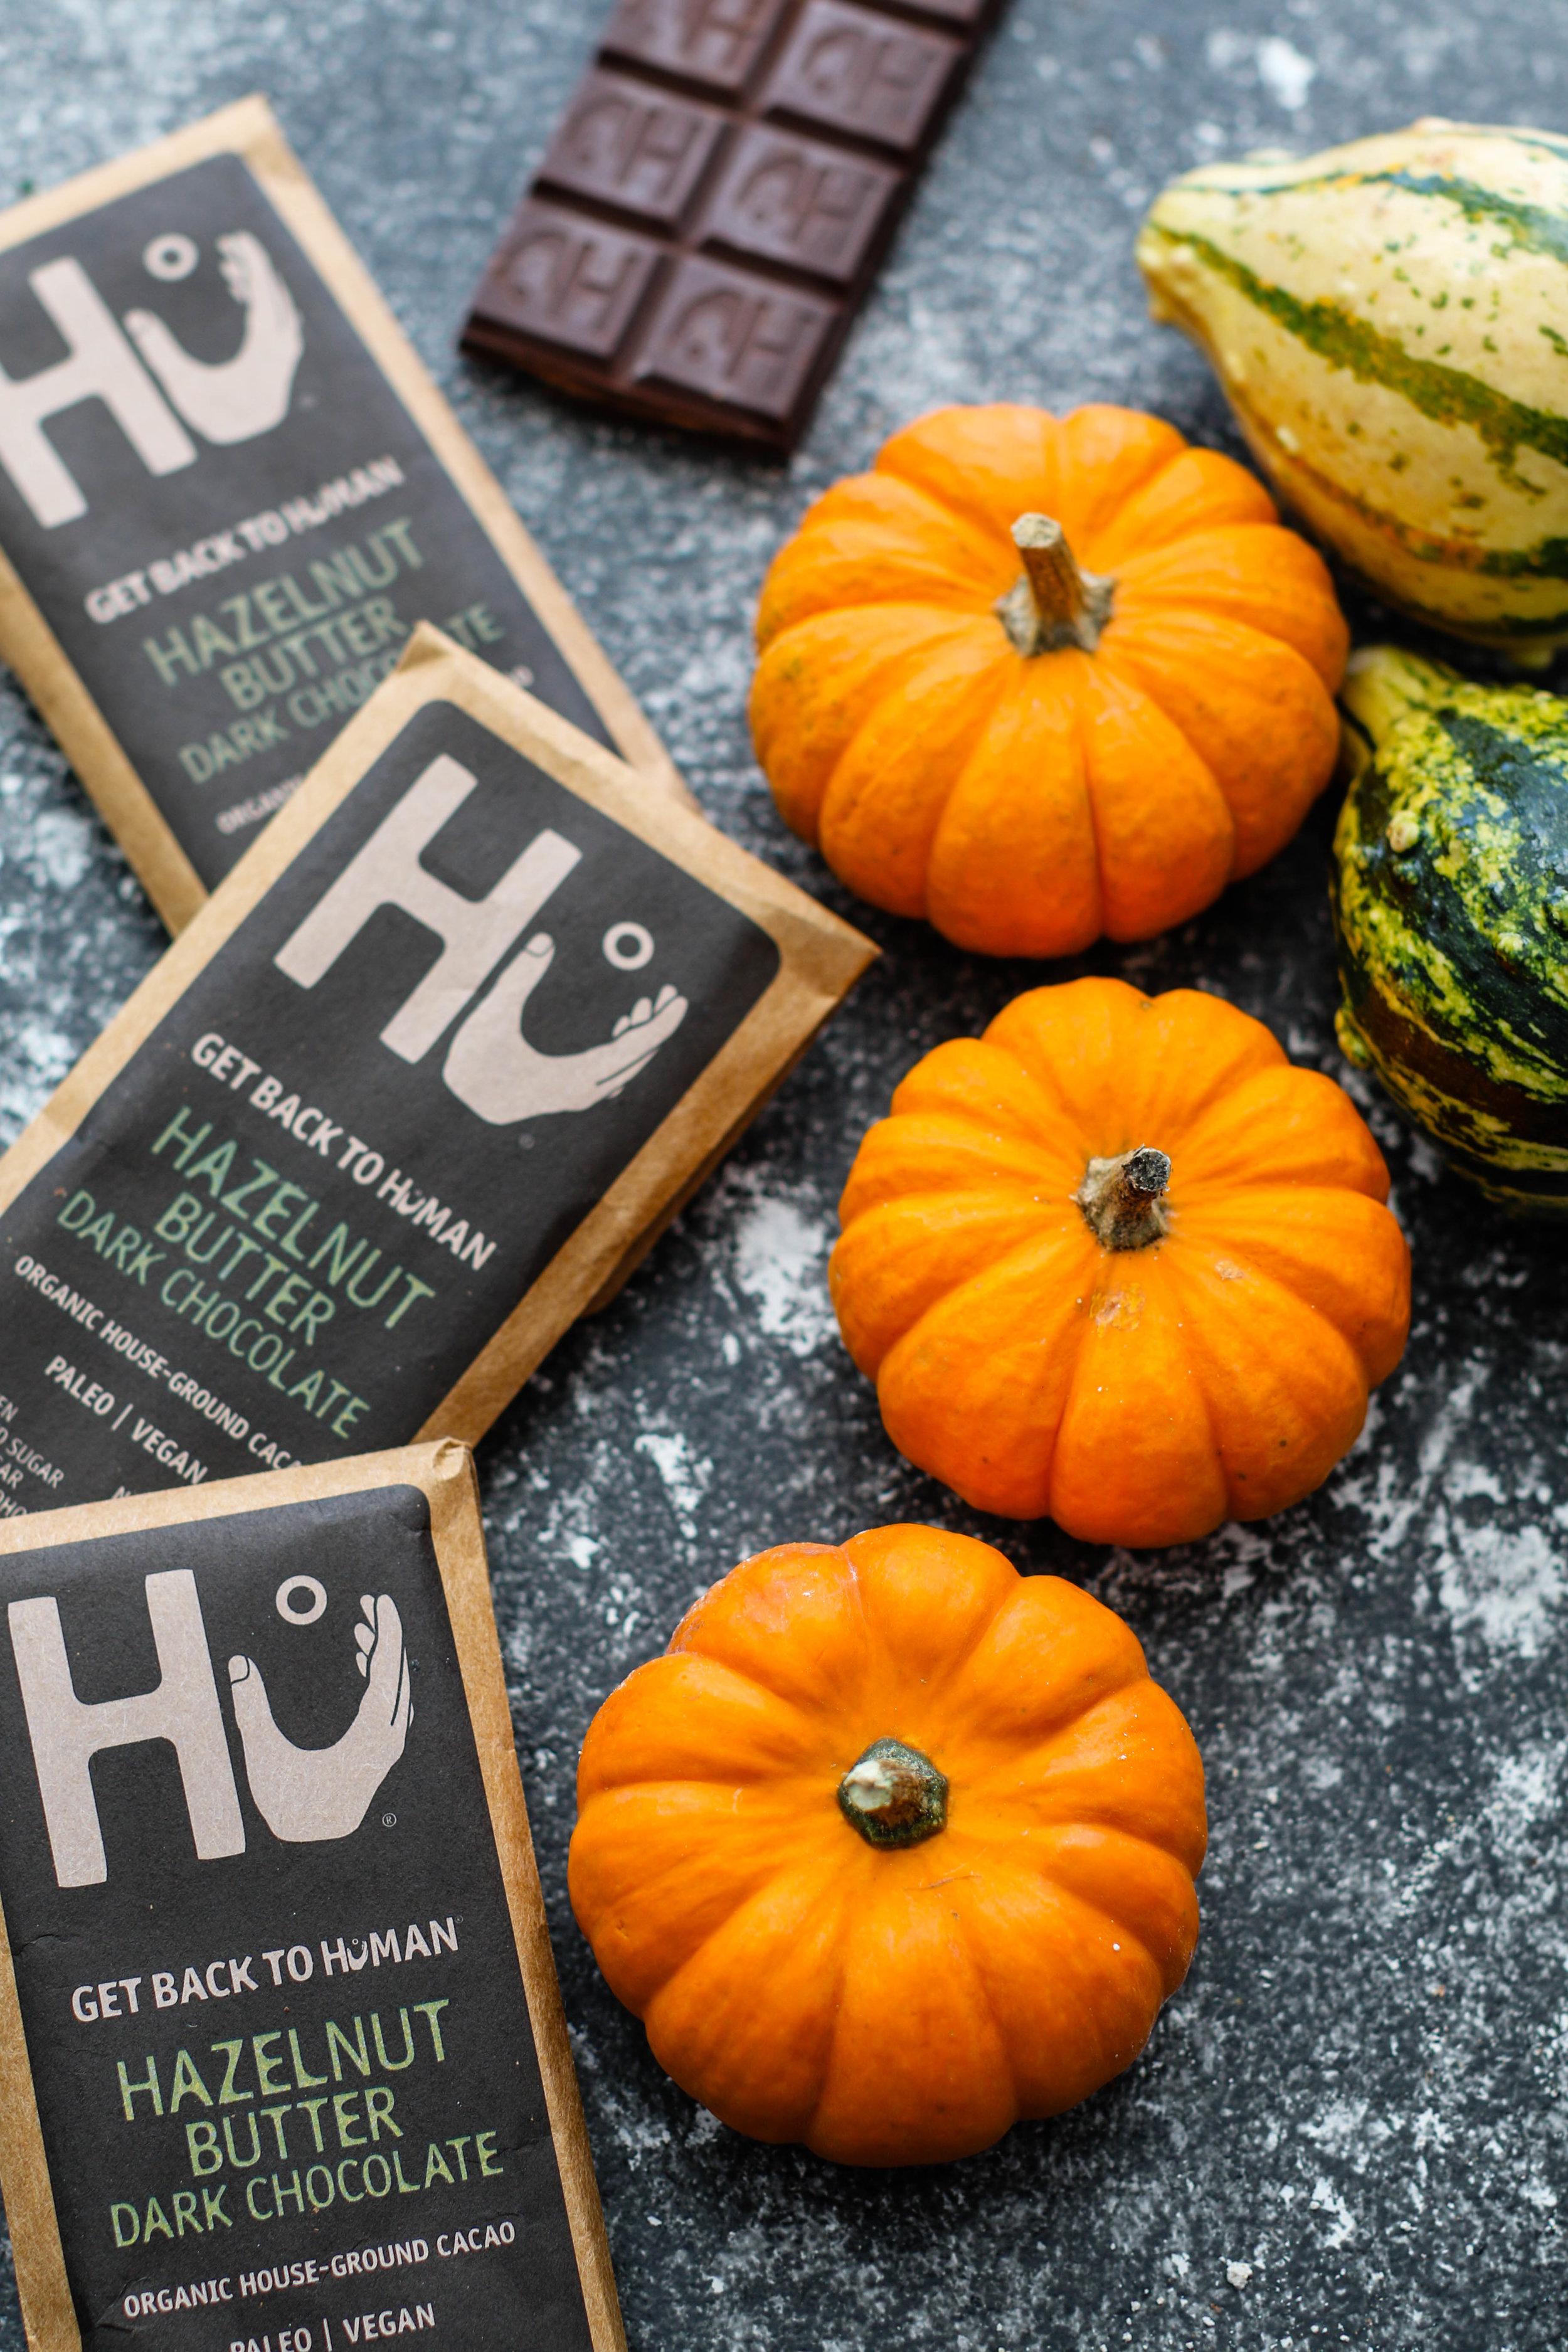 Pumpkin-Chocolate-Chunk-Bread_-2.jpgHu-Chocolate-Vegan-Gluten-Free-Pumpkin-Chocolate-Chunk-Bread-2.jpg